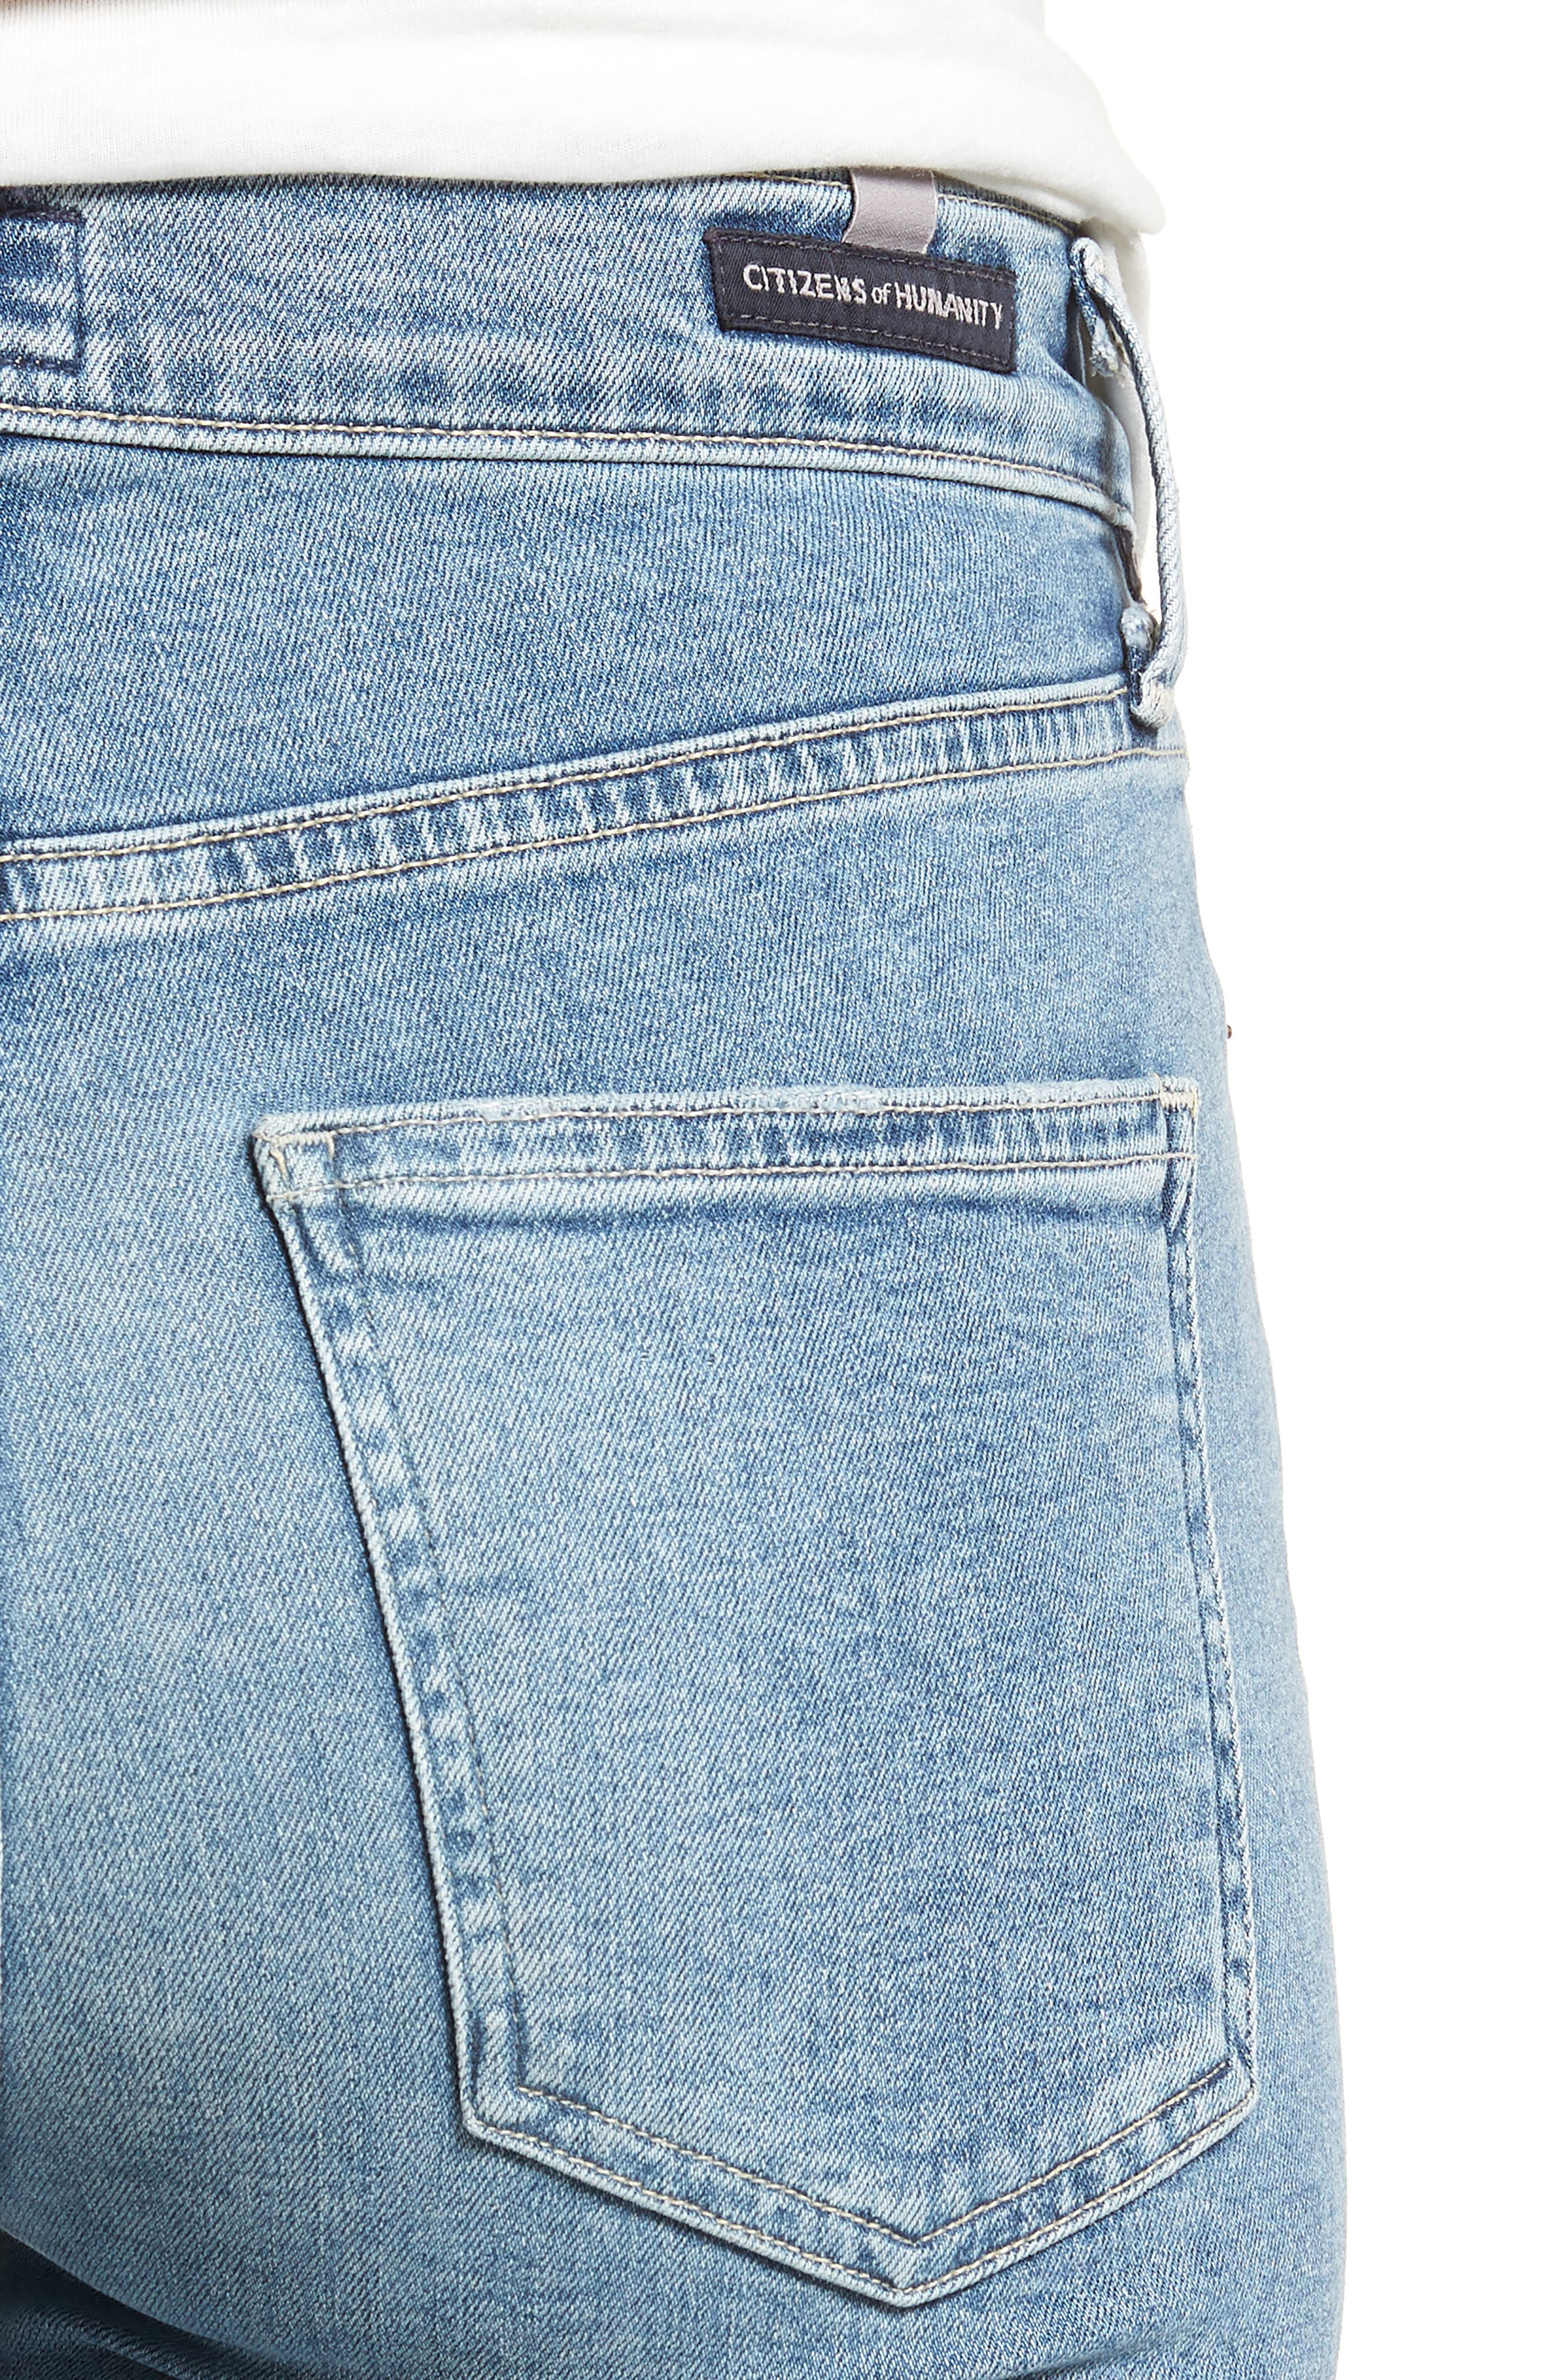 Rocket High Waist Crop Skinny Jeans,                             Alternate thumbnail 4, color,                             457